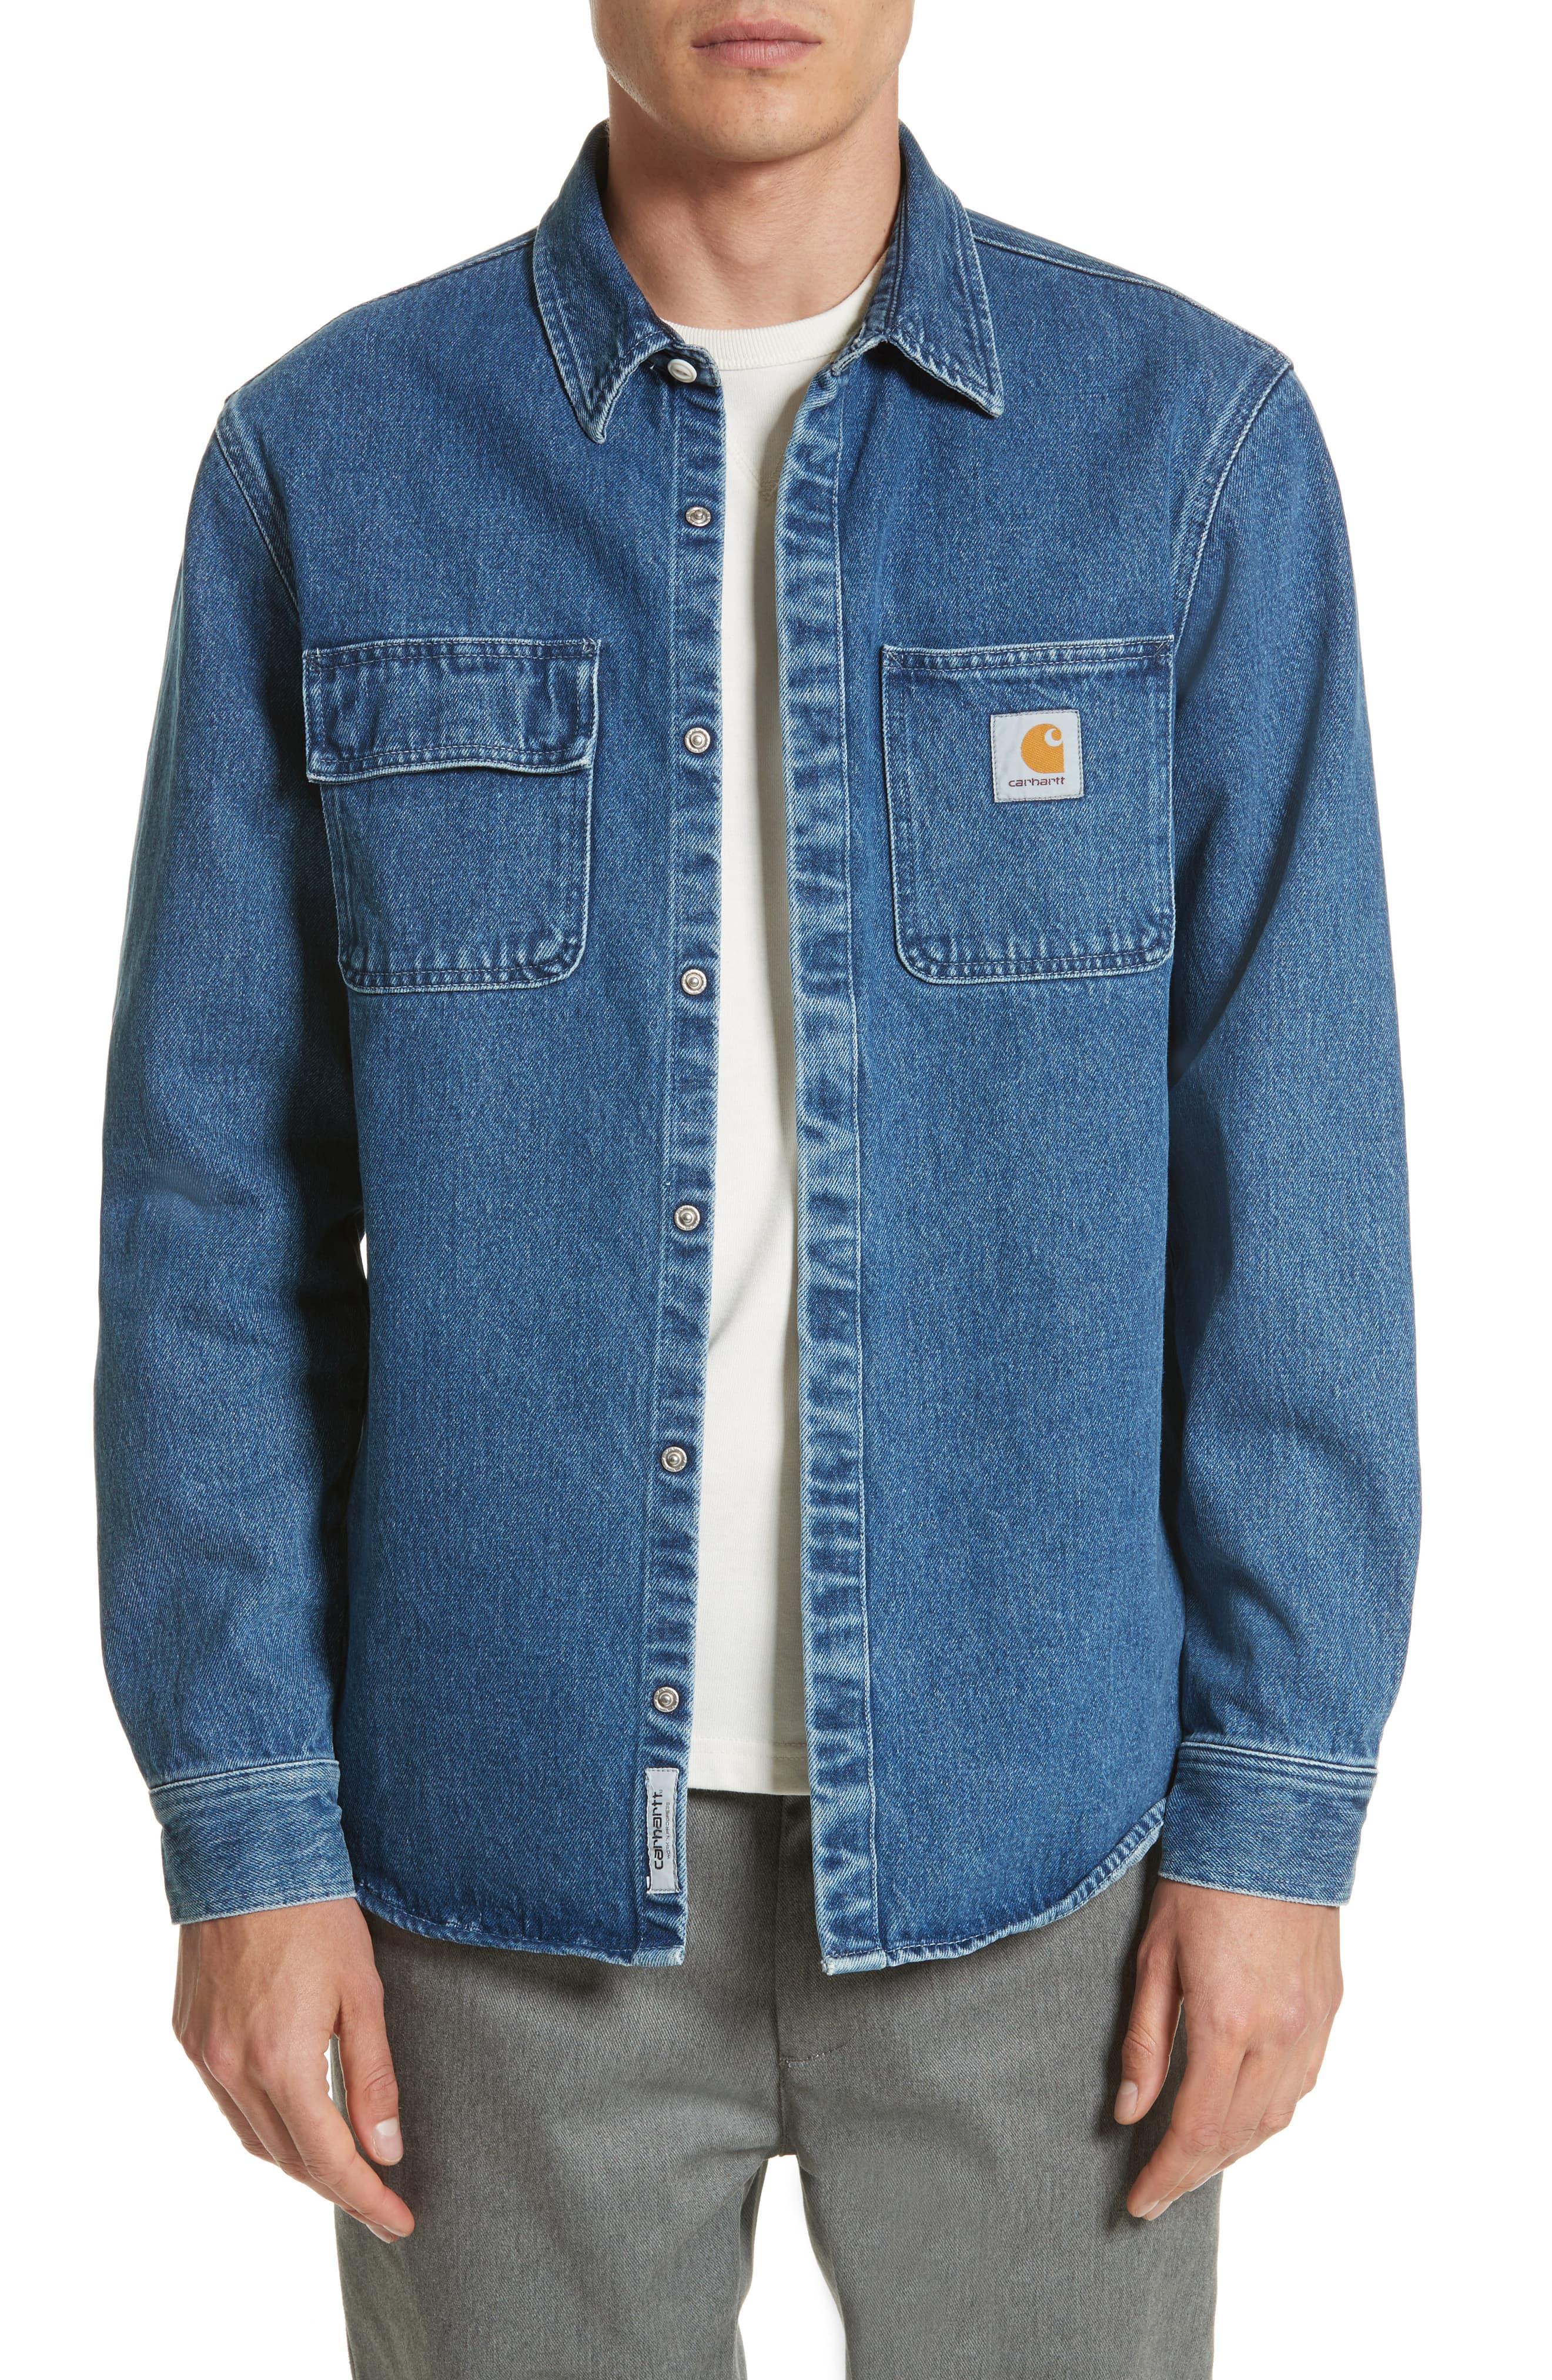 Carhartt Work In Progress Salinac Shirt Jacket Nordstrom Carhartt Denim Jacket Shirt Jacket Men Carhartt Jacket [ 4048 x 2640 Pixel ]